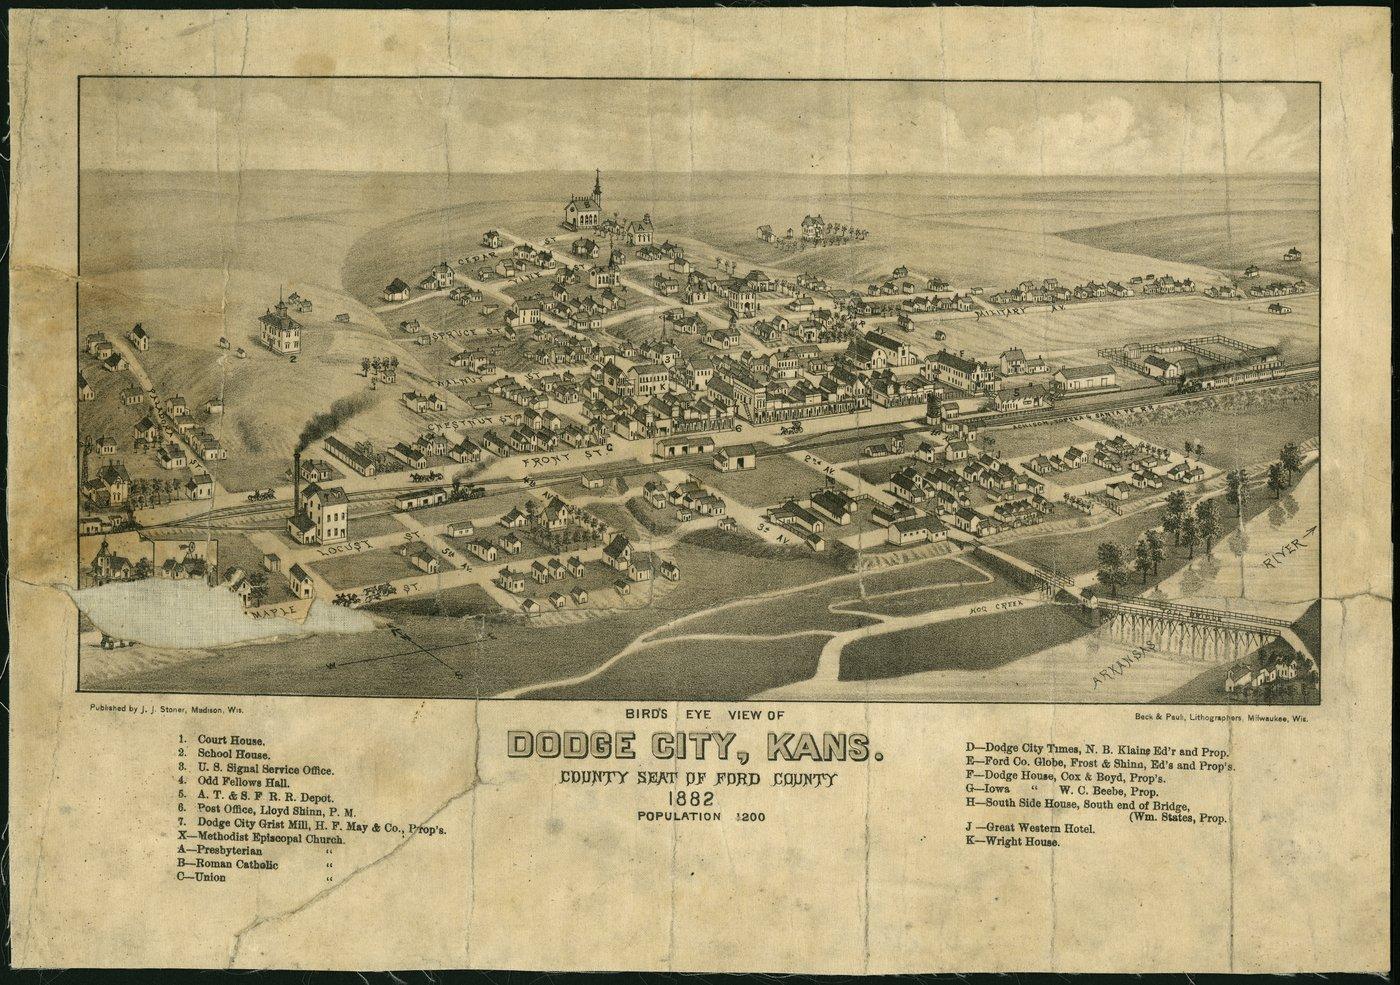 Bird's eye view of Dodge City, Ford County, Kansas